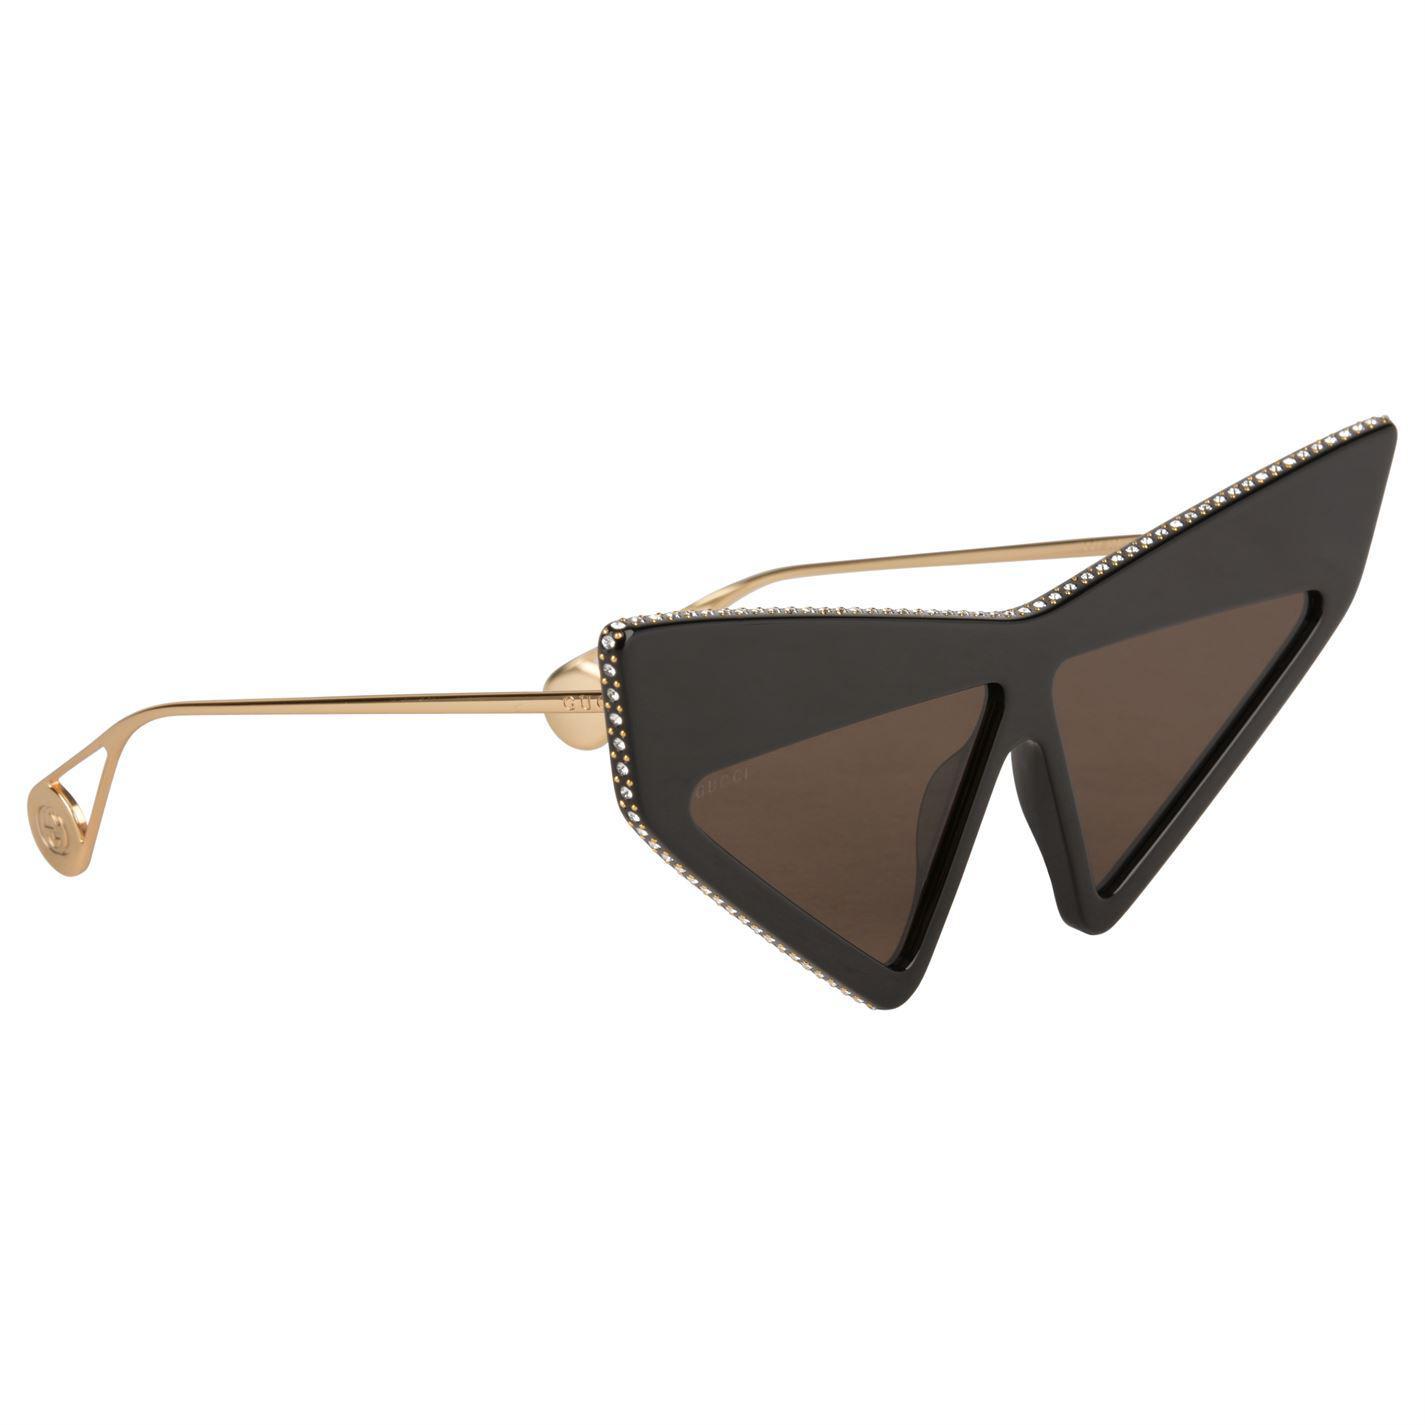 cfed495e4f Gucci - Brown Mask Frame Acetate Sunglasses - Lyst. View fullscreen